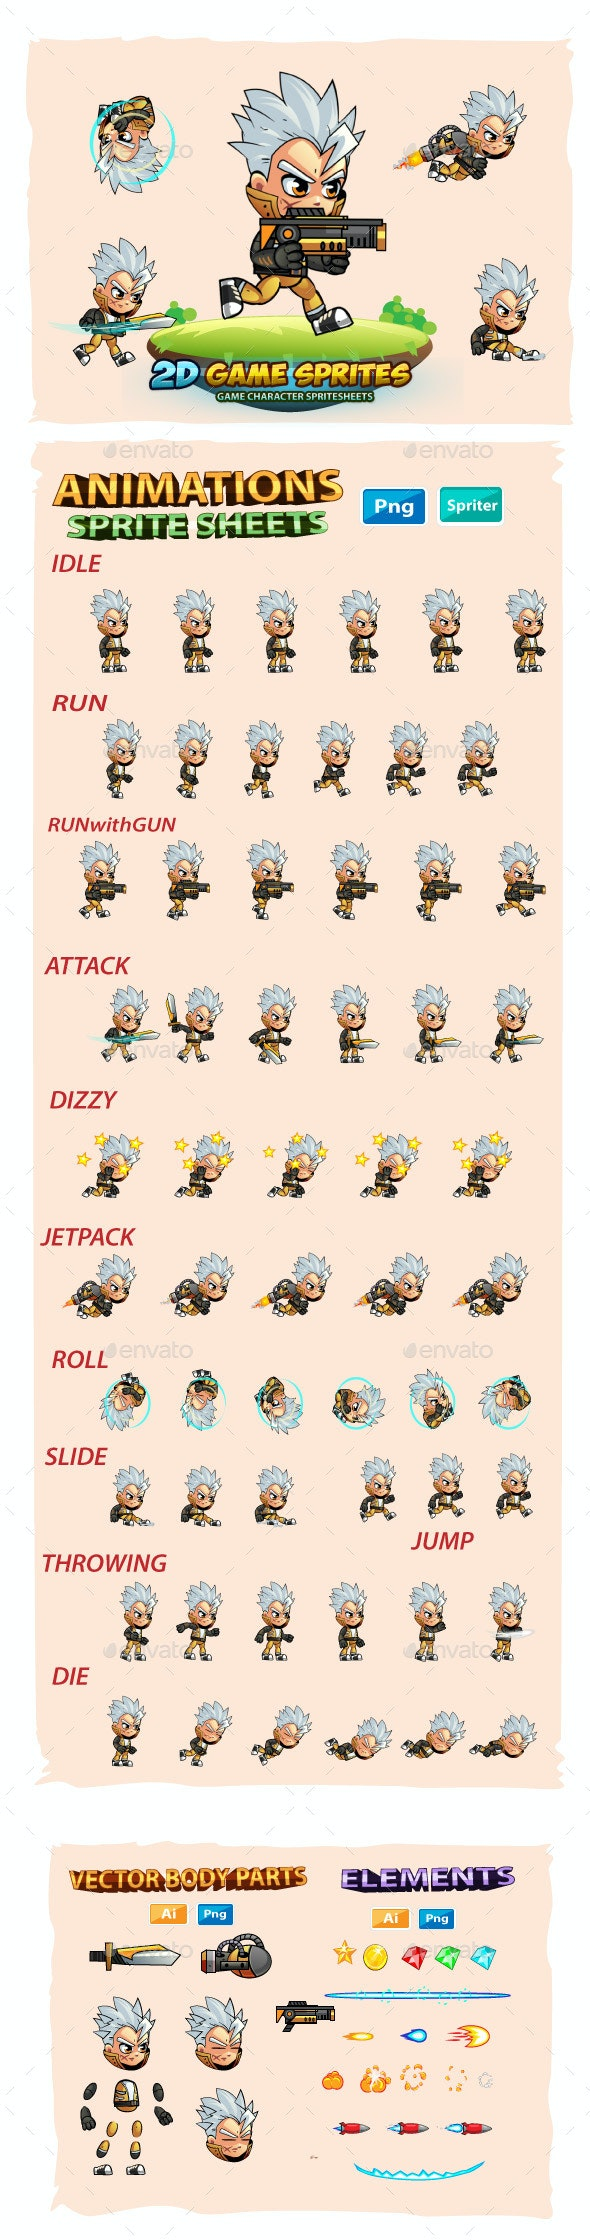 Allan 2D Game Character Sprites - Sprites Game Assets